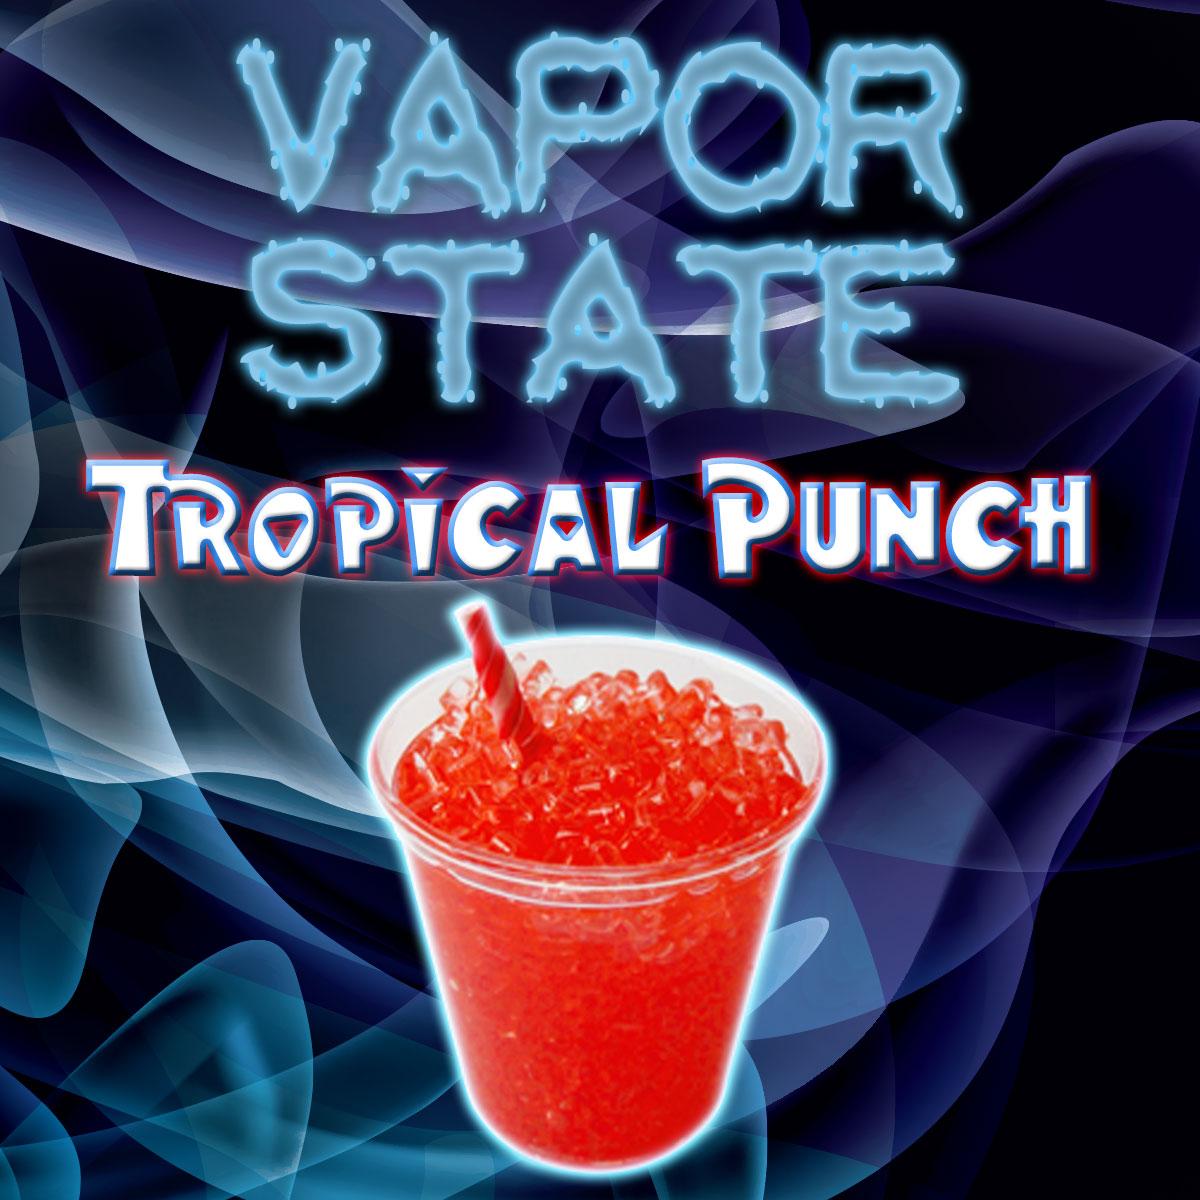 Tropical-Punch.jpg